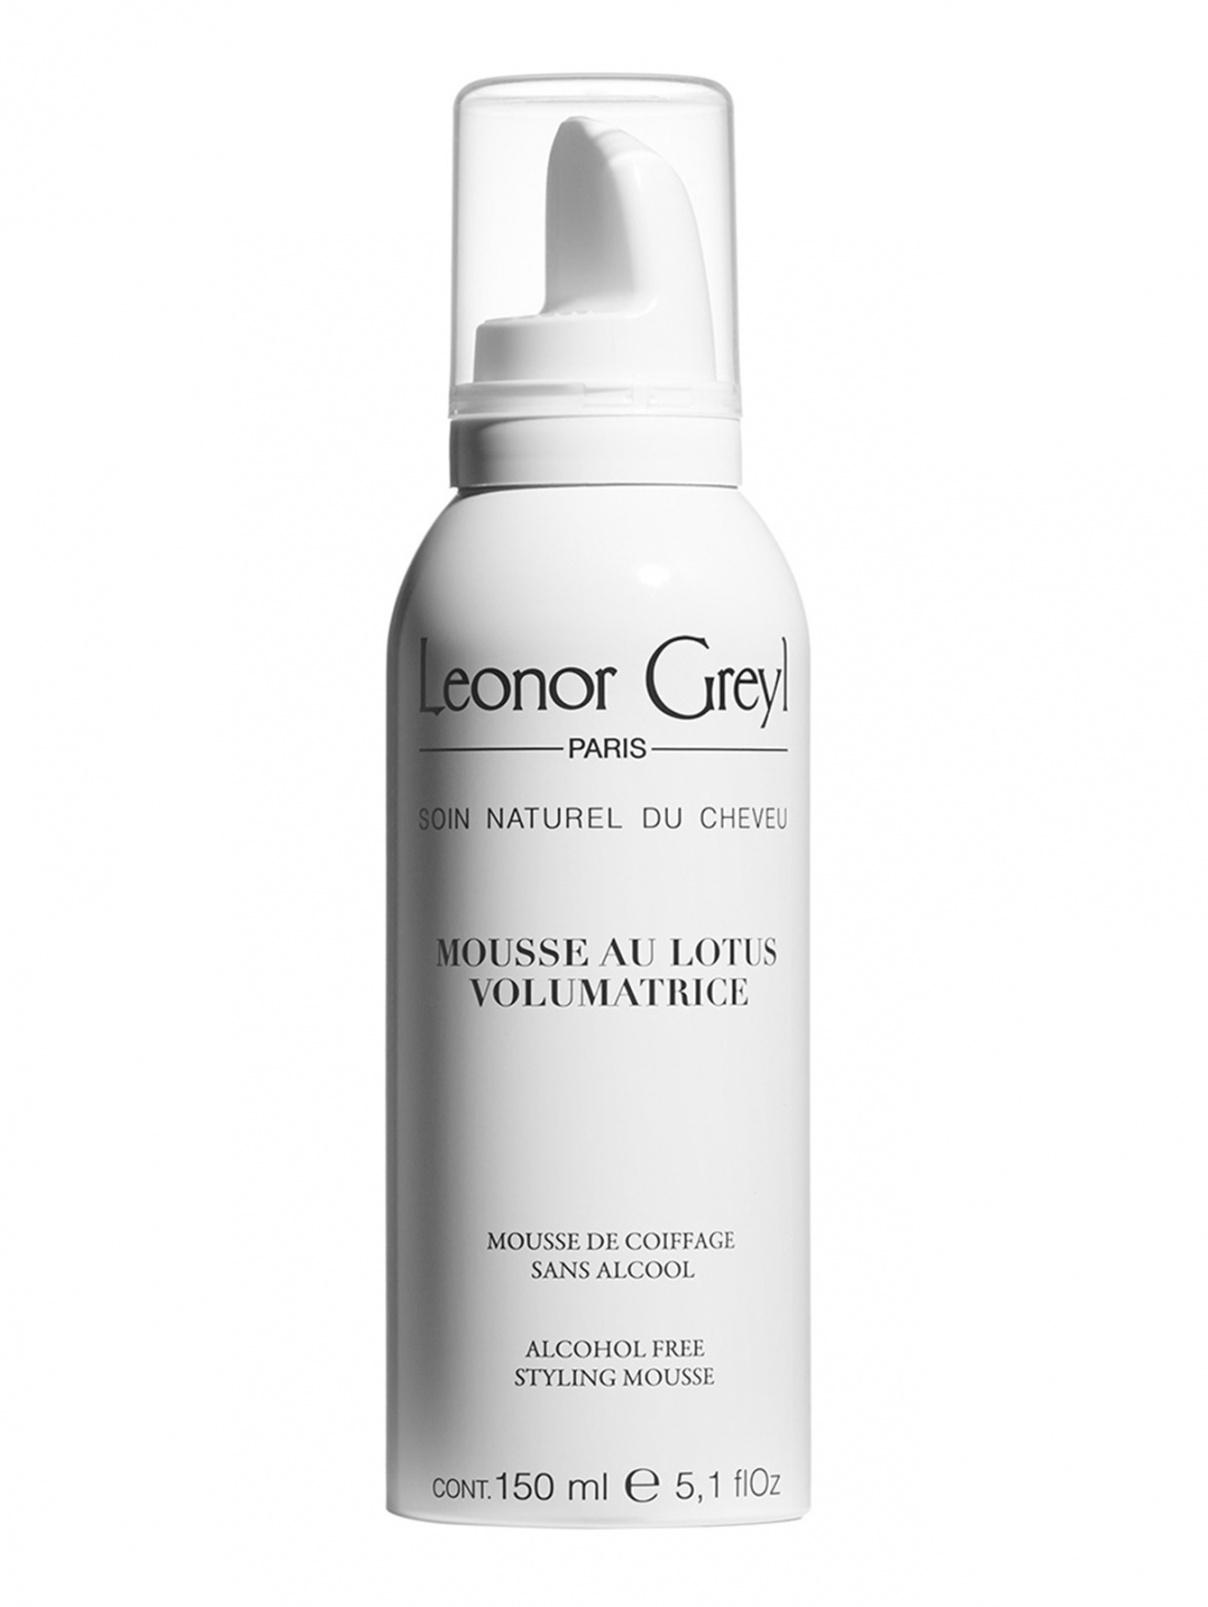 Мусс для объема с лотосом - Hair Care, 150ml Leonor Greyl  –  Общий вид